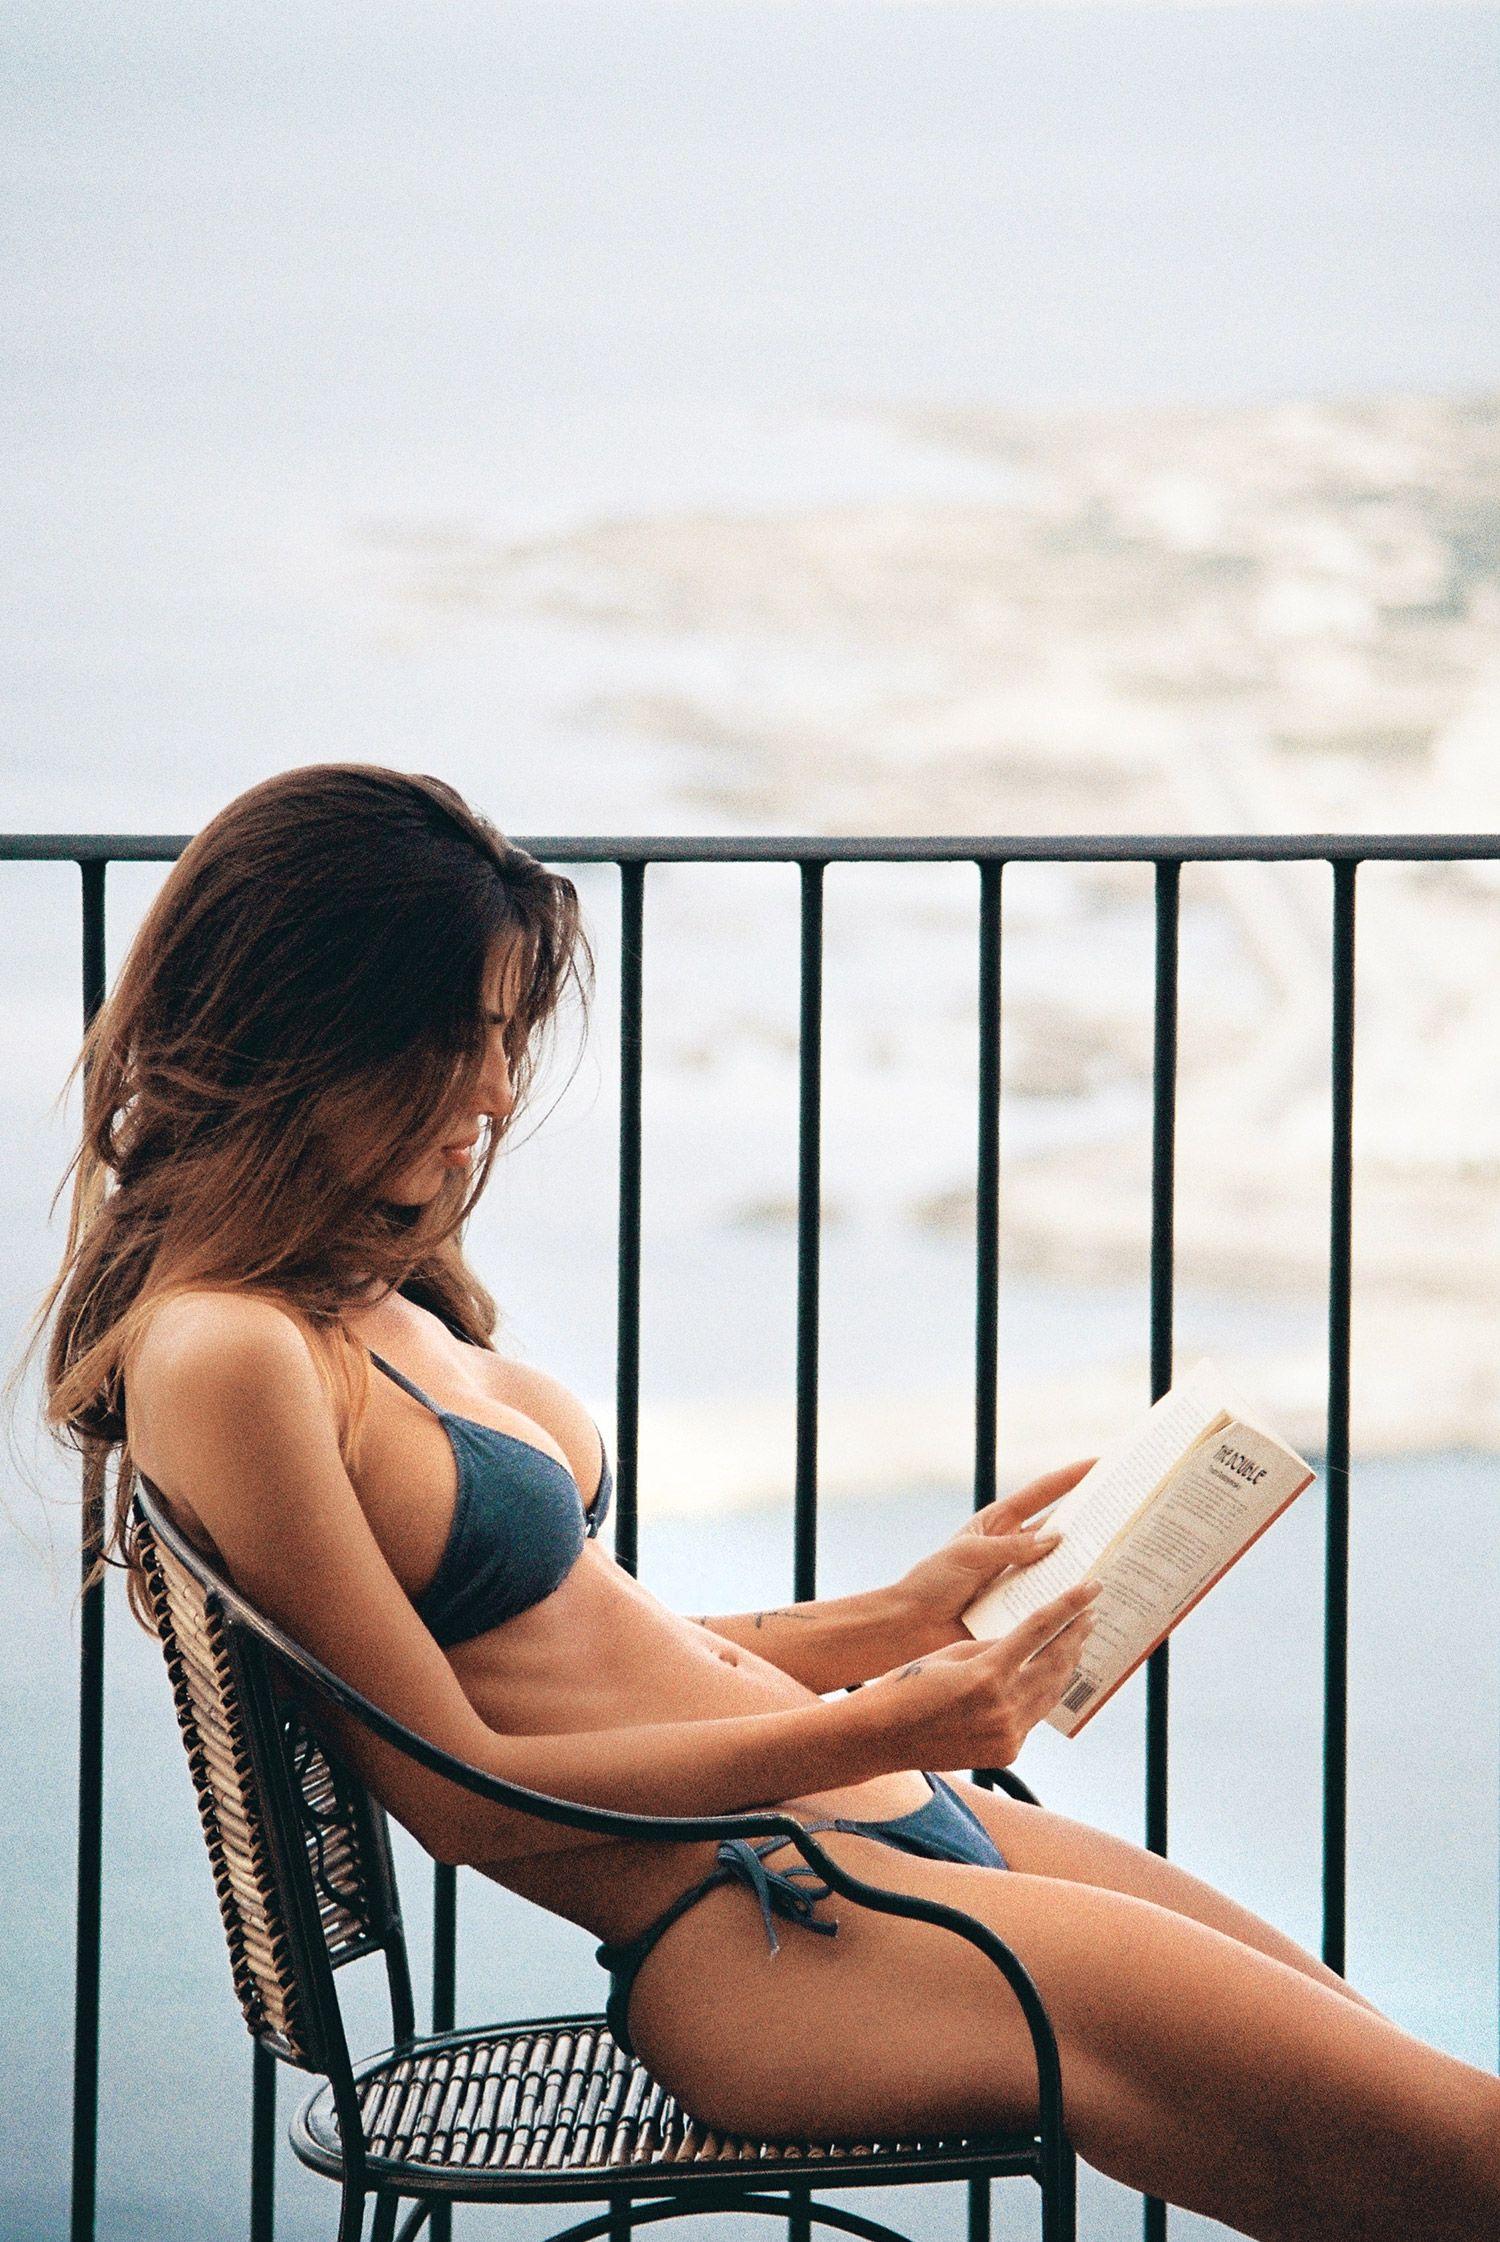 Valeriya-Volkova-Topless-Bikini-17